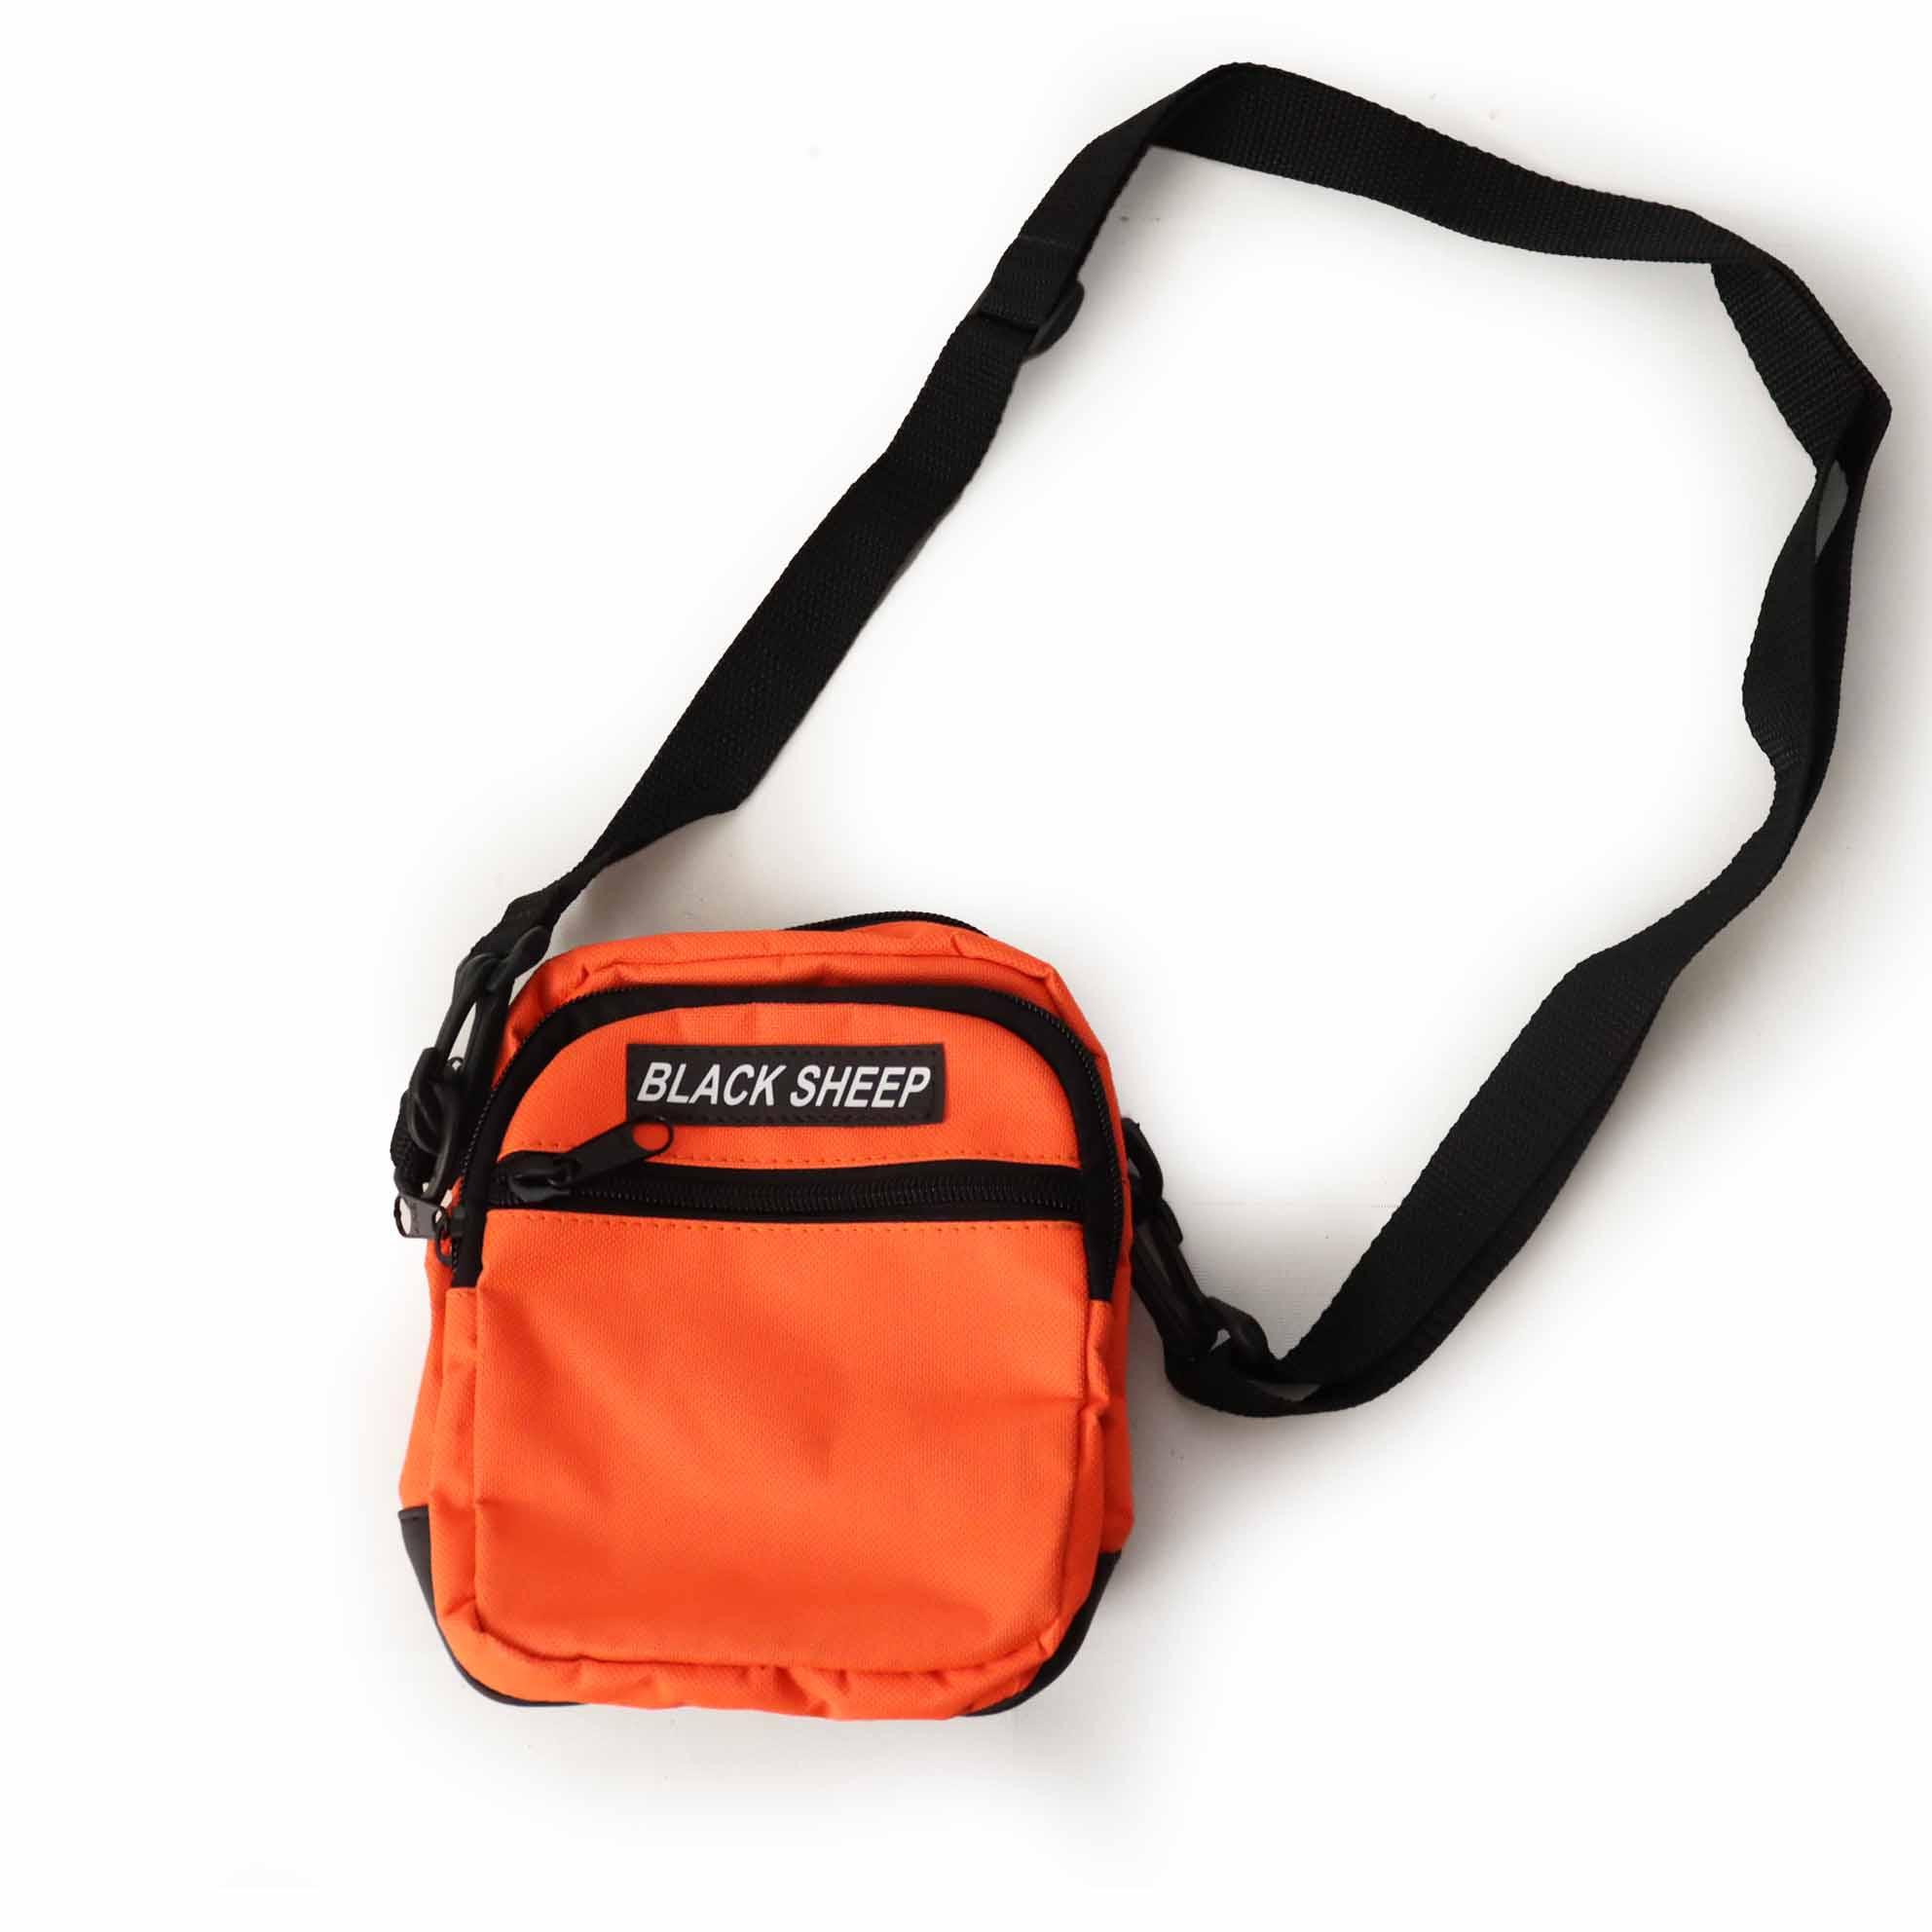 Shoulder Bag Black Sheep - Laranja Neon